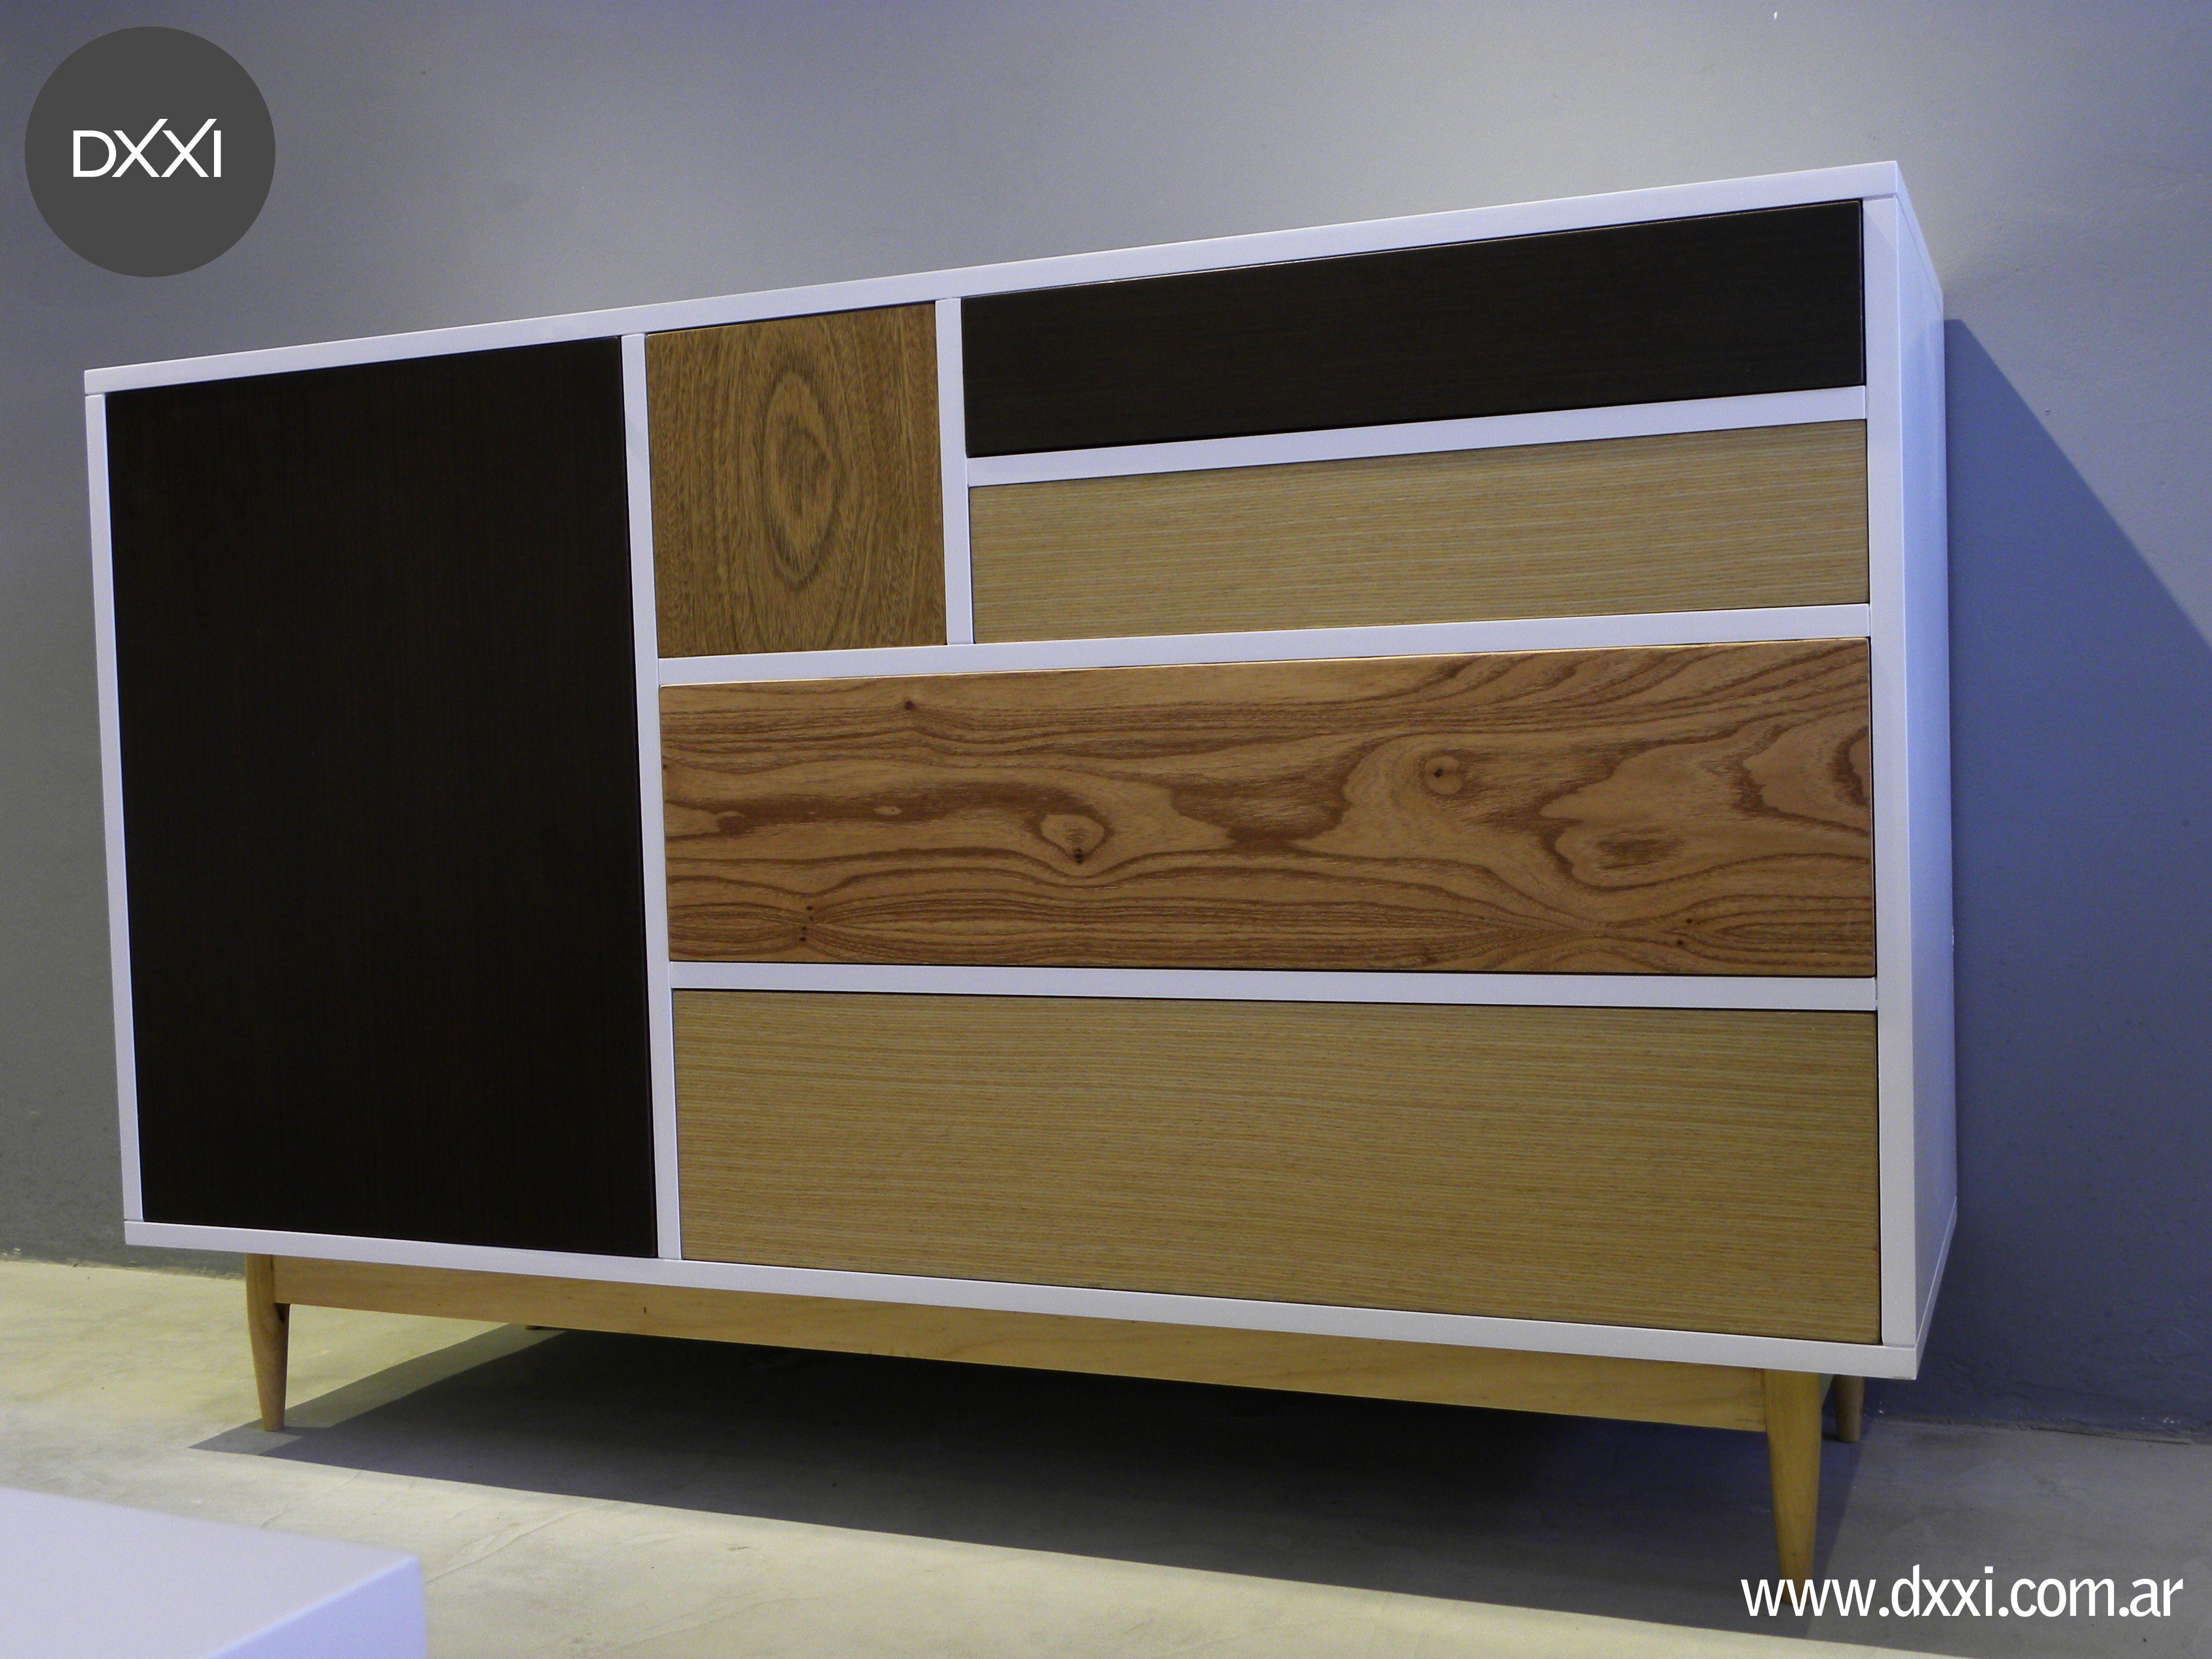 Comoda modelo Woddy. Estructura de apoyo de madera maciza Guatambu ...